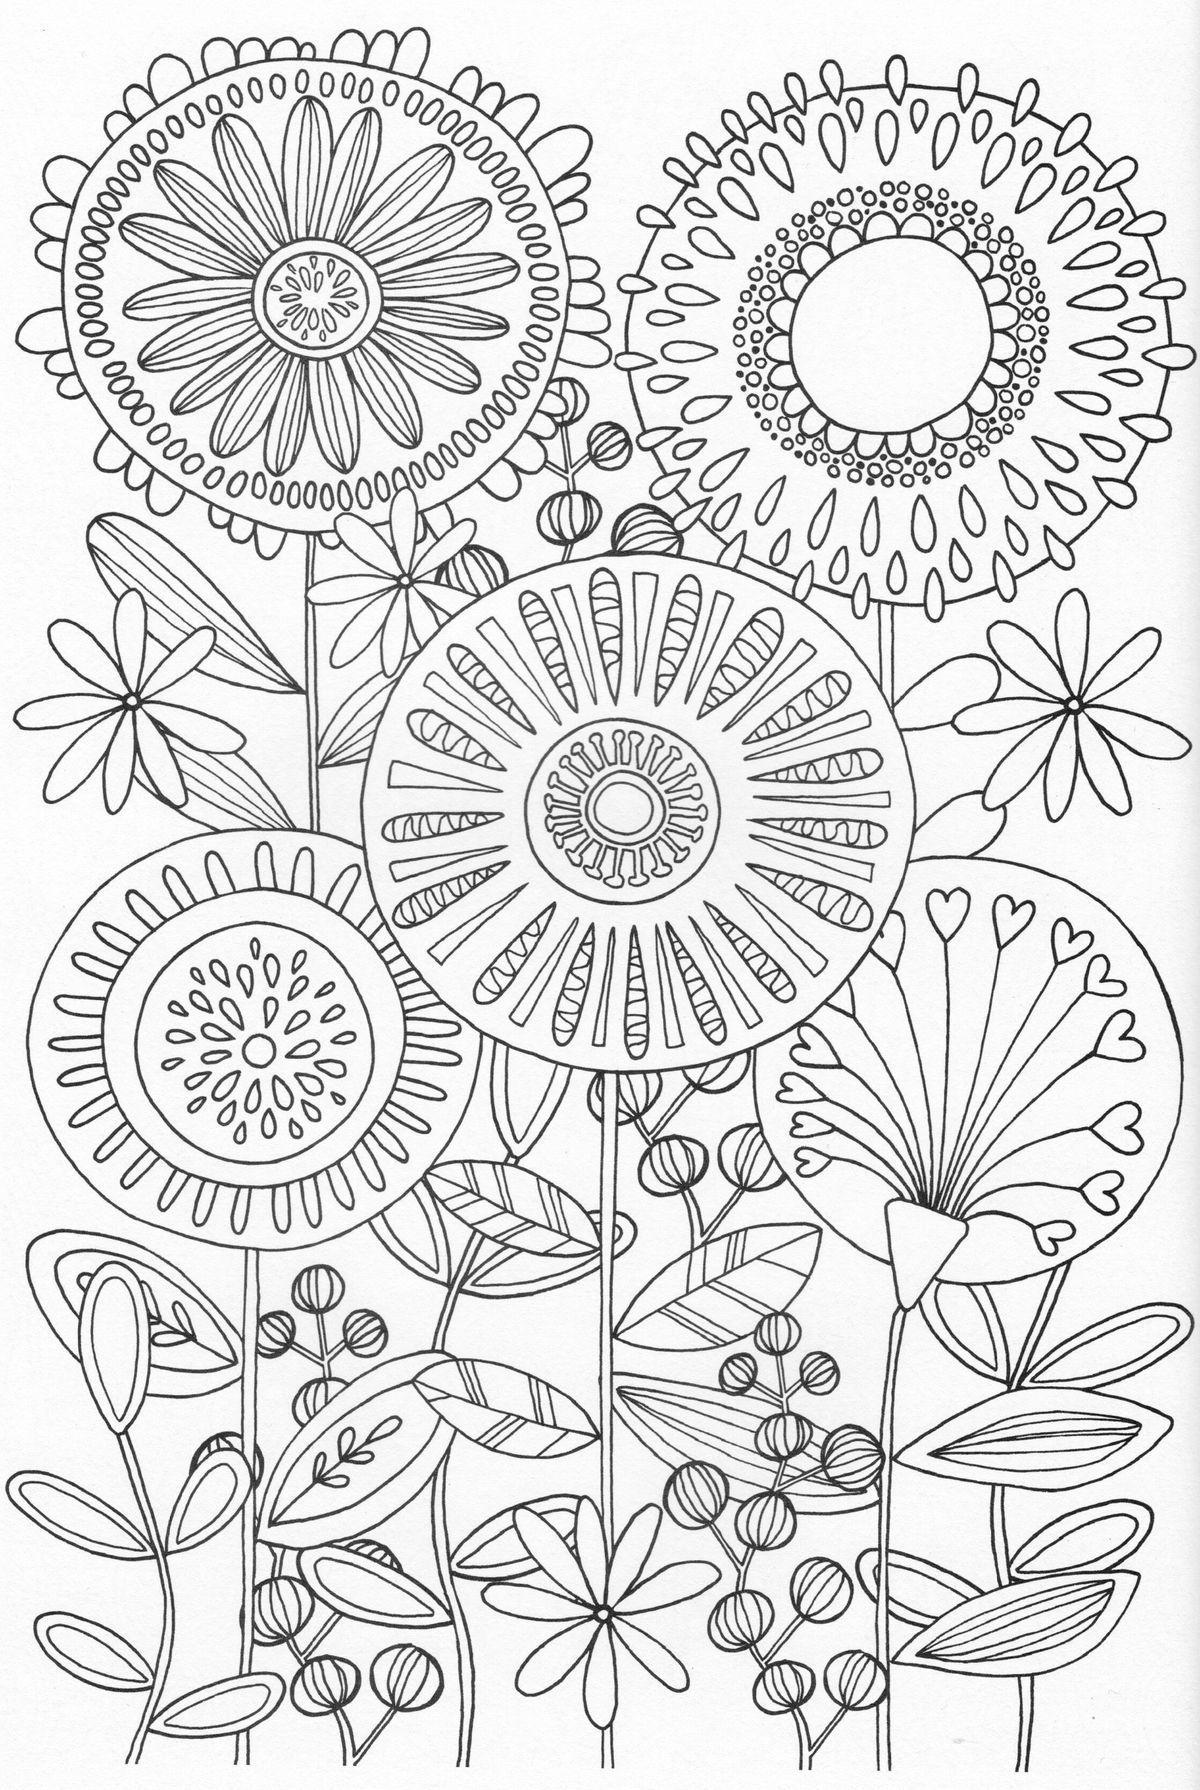 Scandinavian Coloring Book Pg 31 Mandala Coloring Pages Mandala Coloring Books Printable Flower Coloring Pages